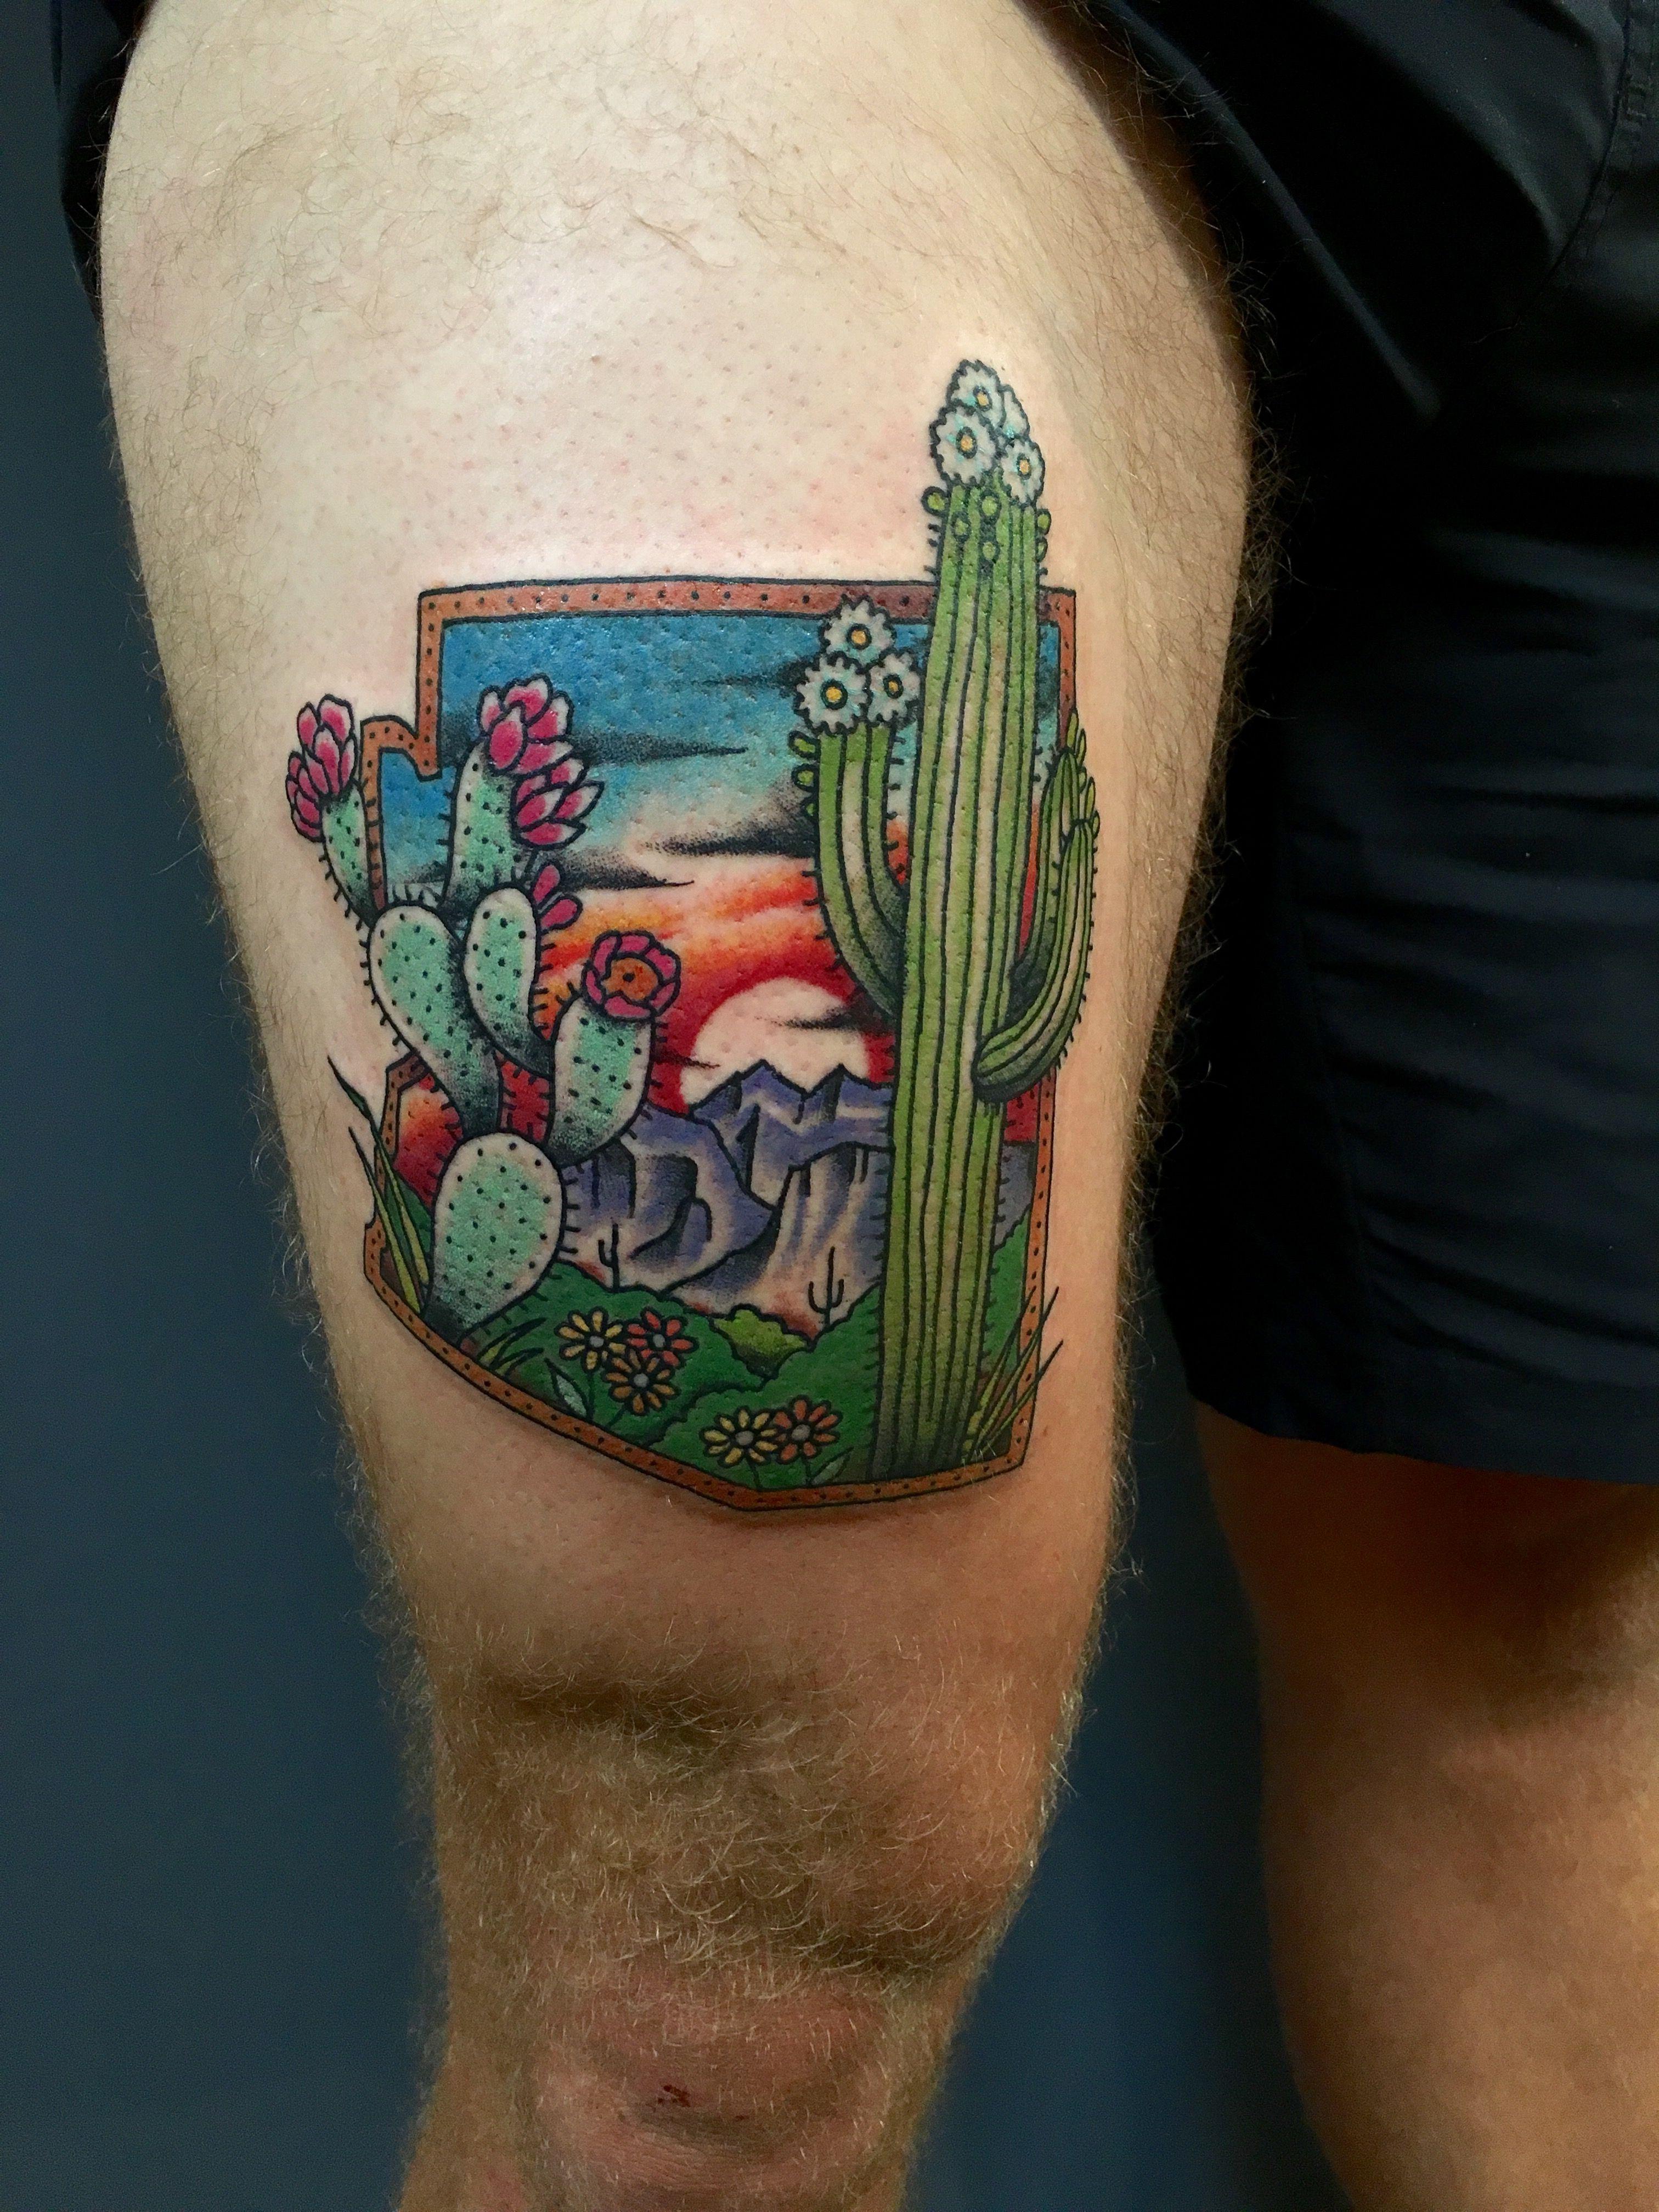 Blooming arizona desert by paulski at golden rule tattoo